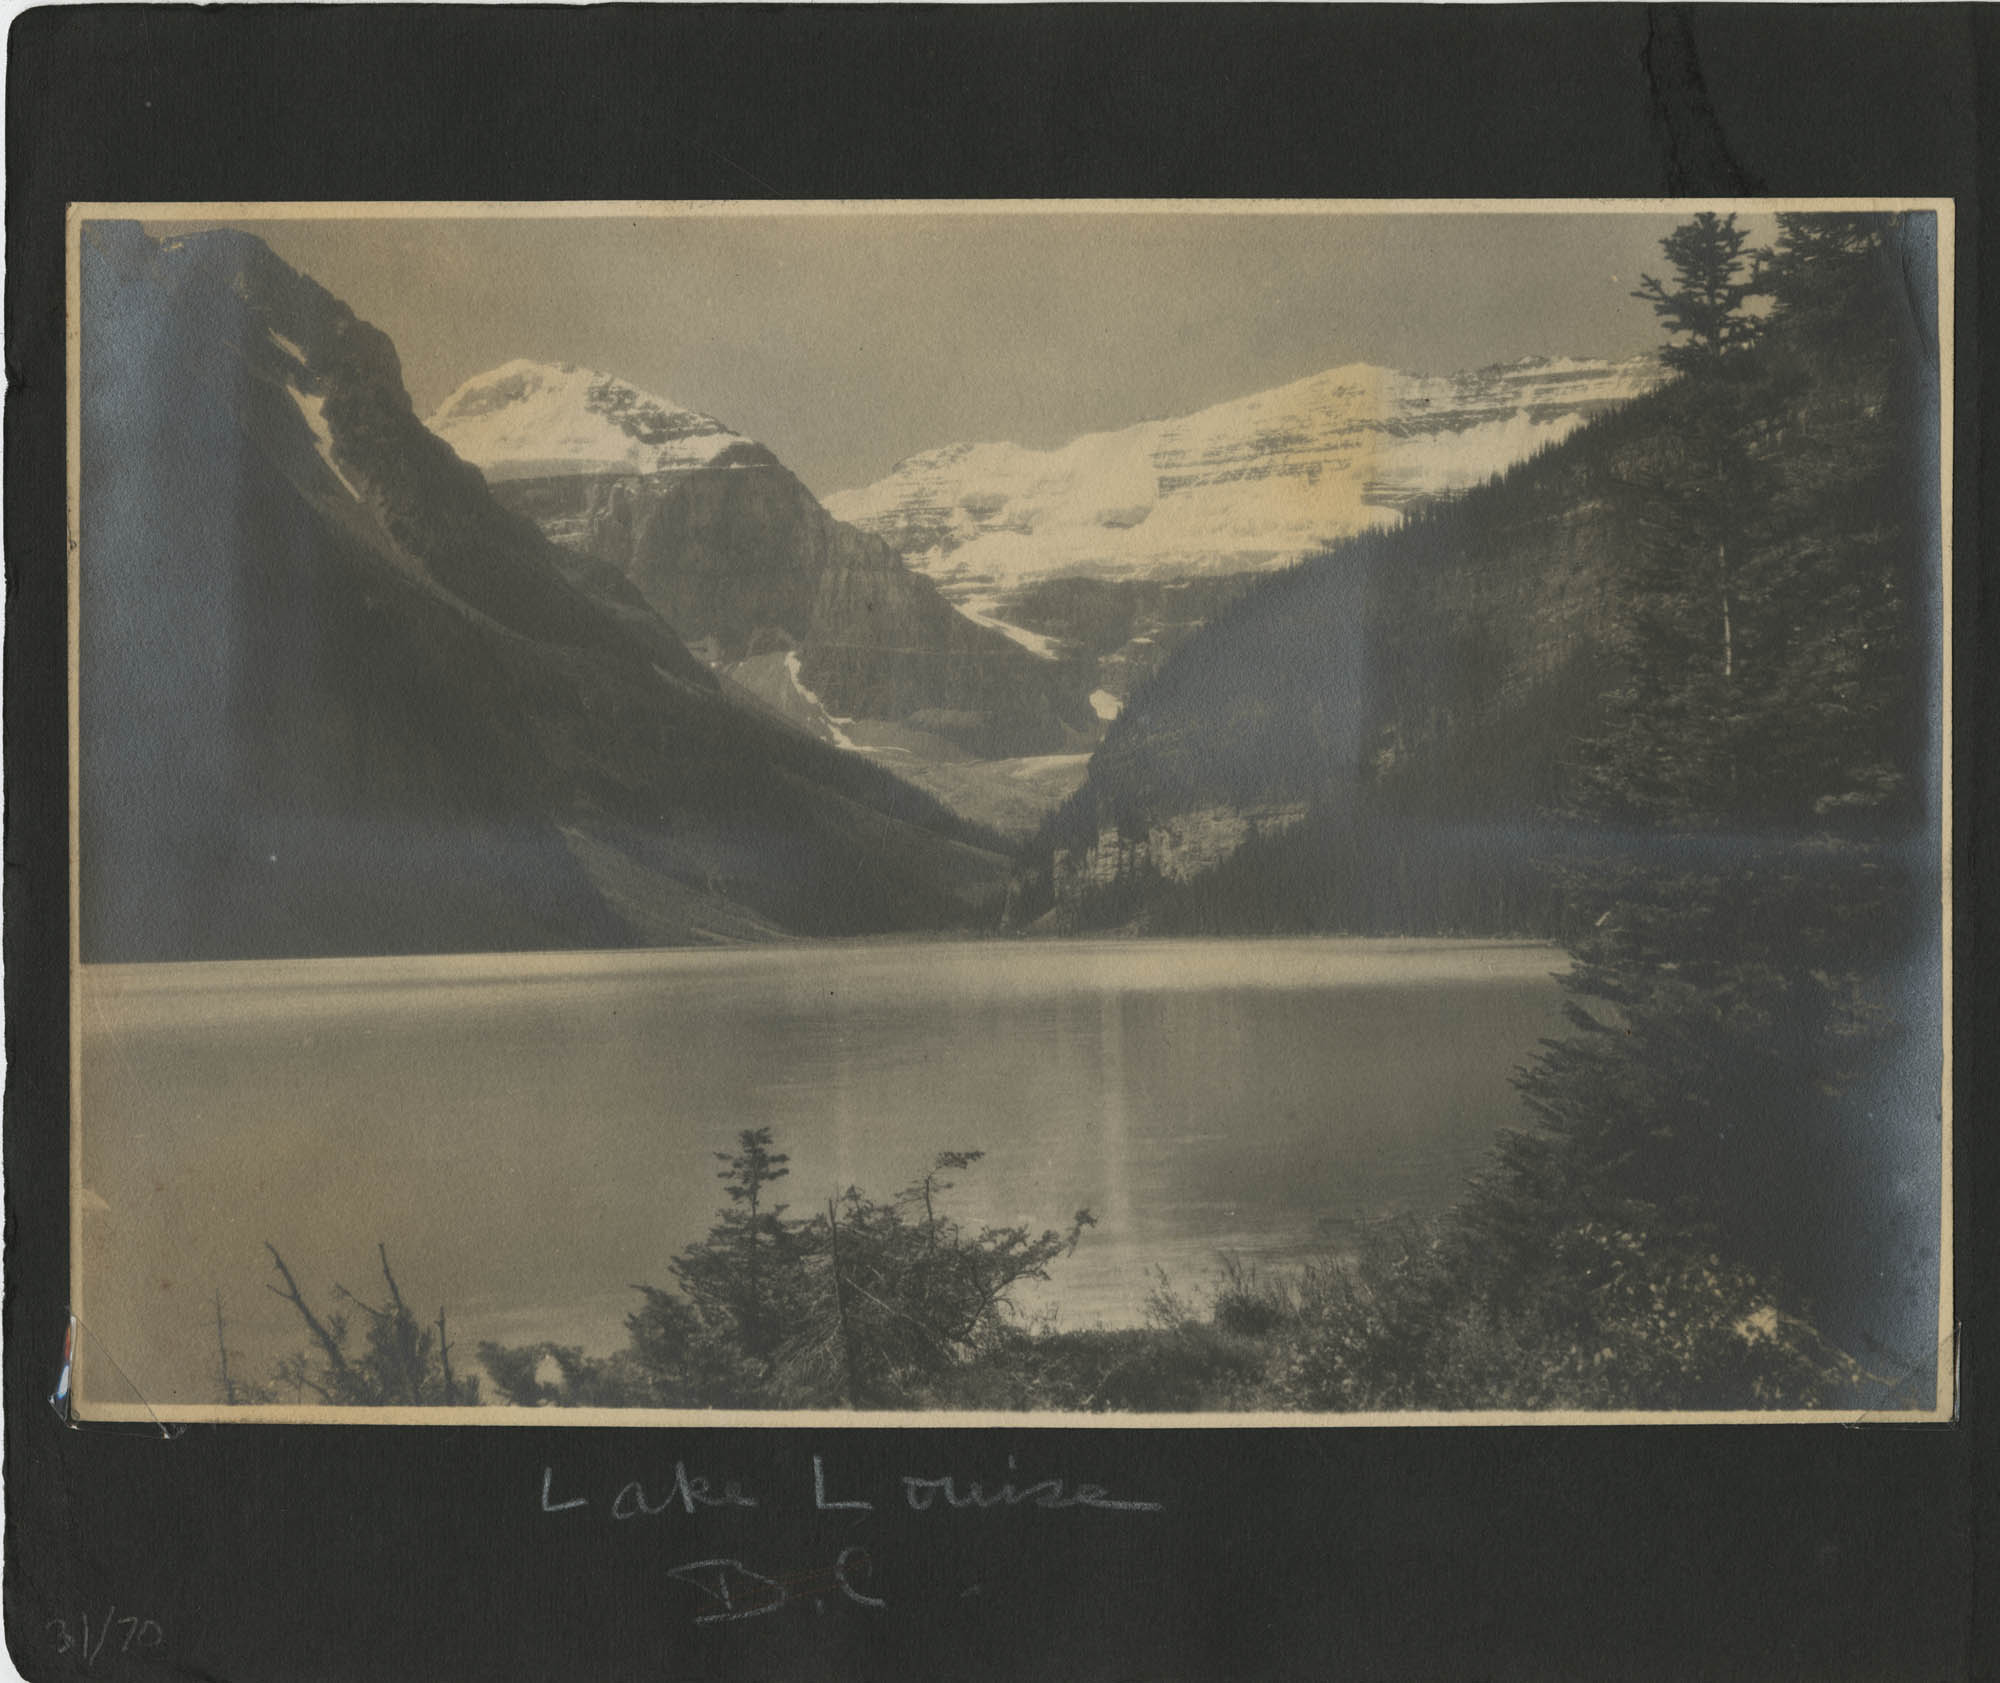 Alaska Photograph Album, 1926, Page 31